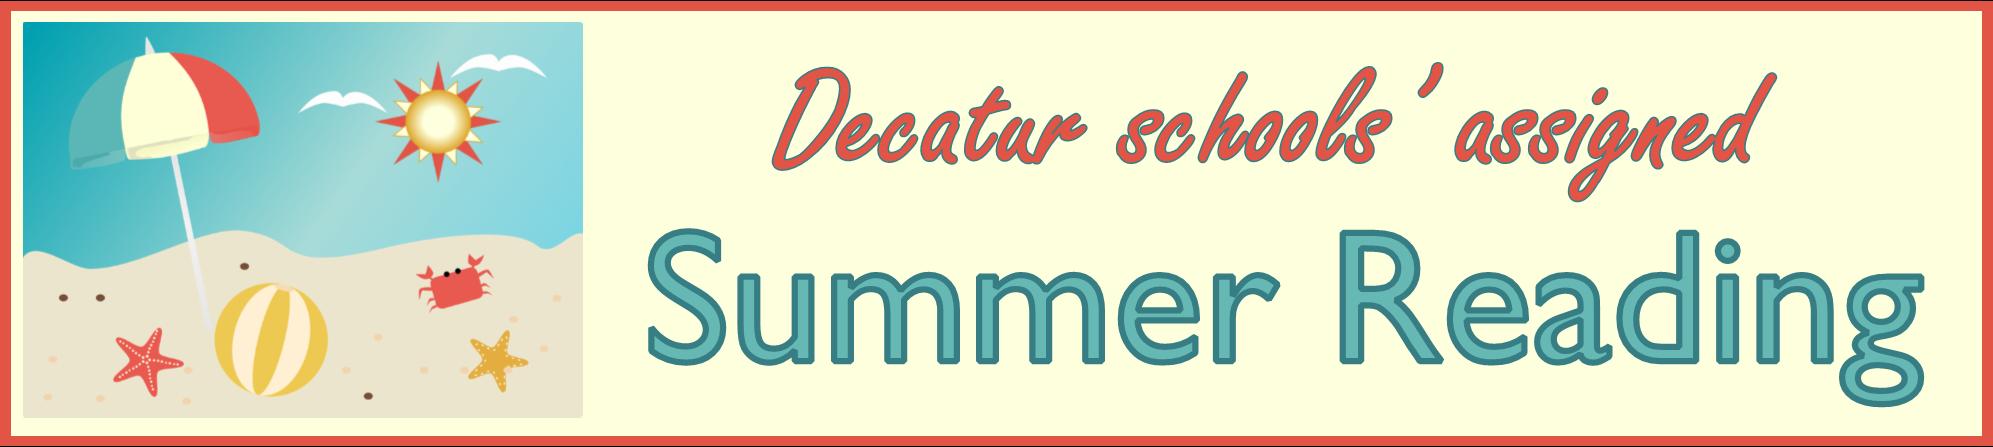 DecaturSchoolsAssignedReadingBAnner